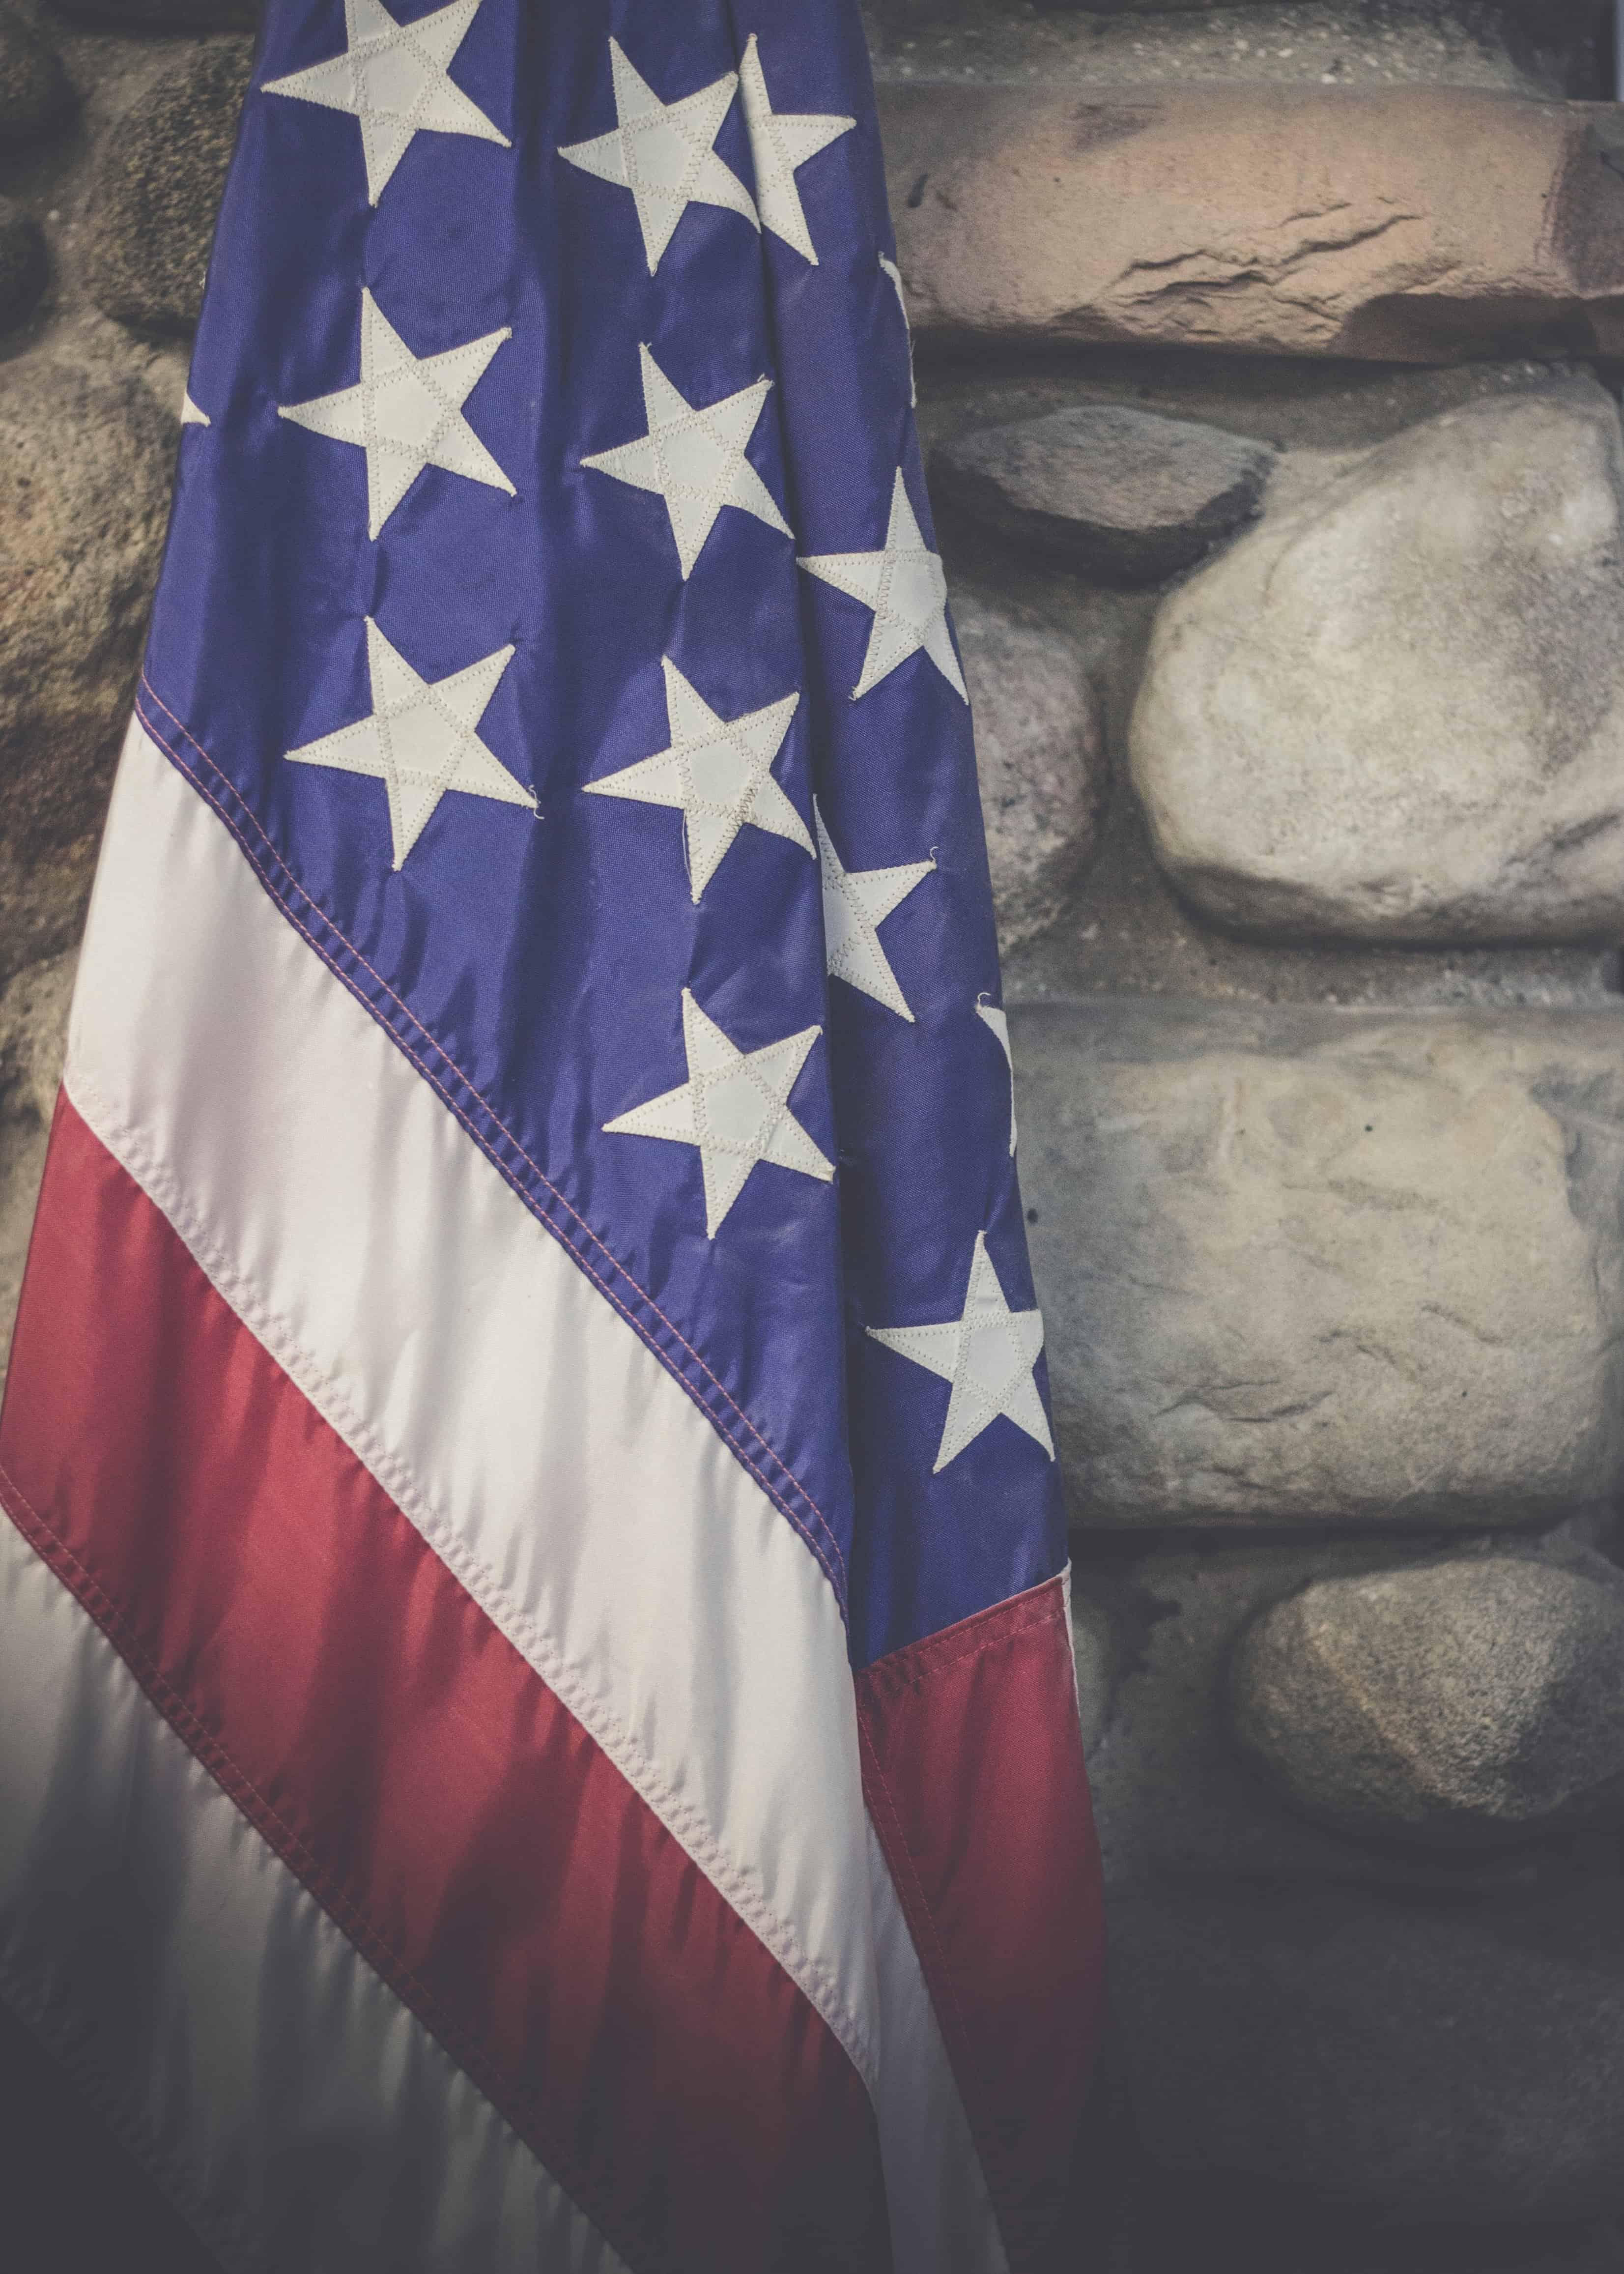 2019 veterans day discounts